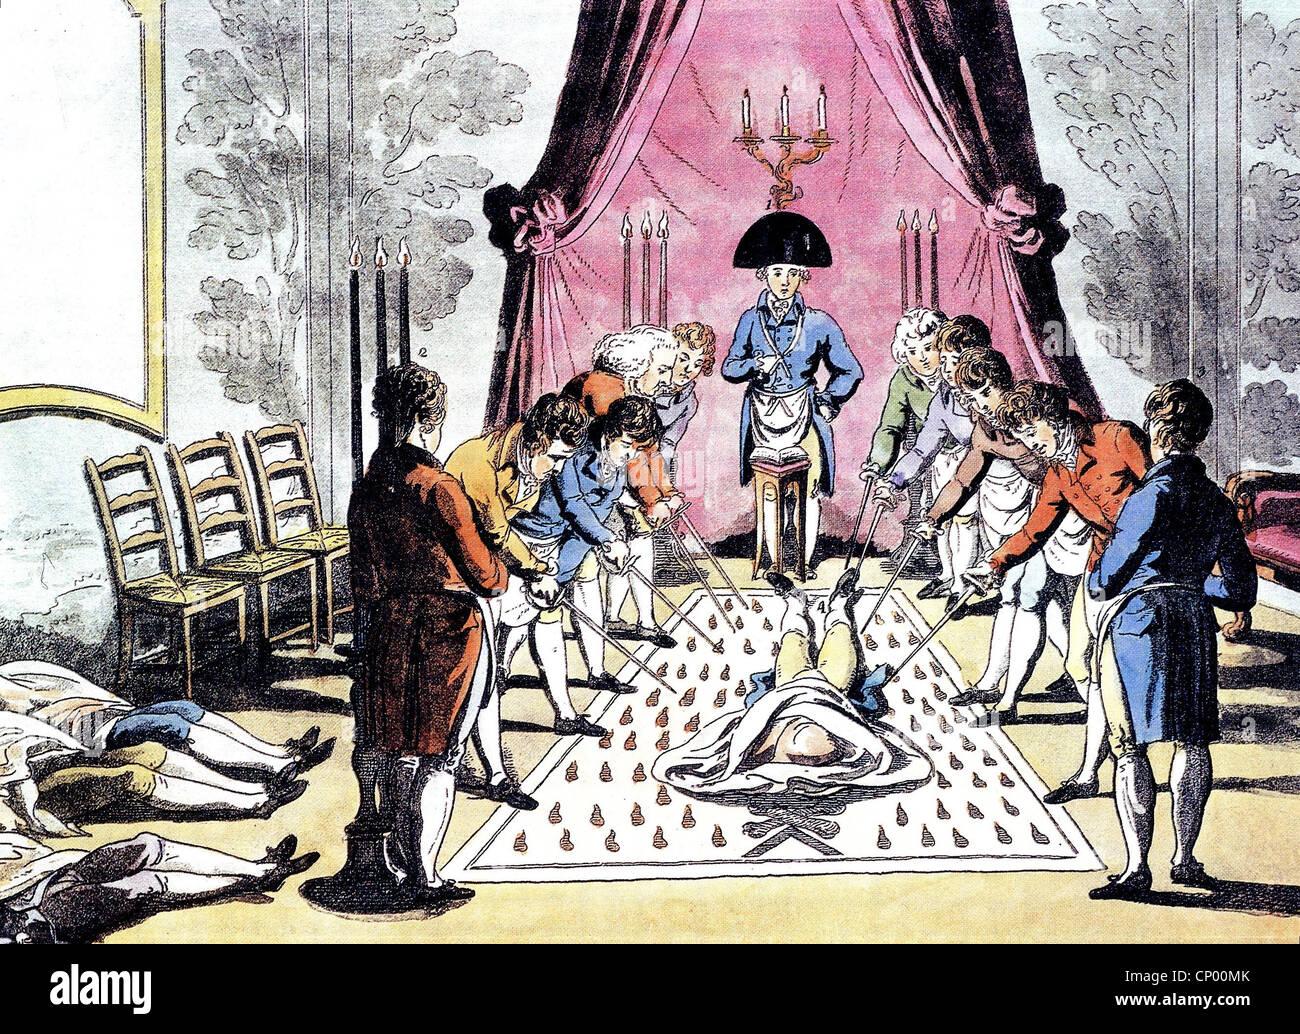 freemason, Masonic lodge, master ennoblement, ritual, coloured Stock Photo - Alamy